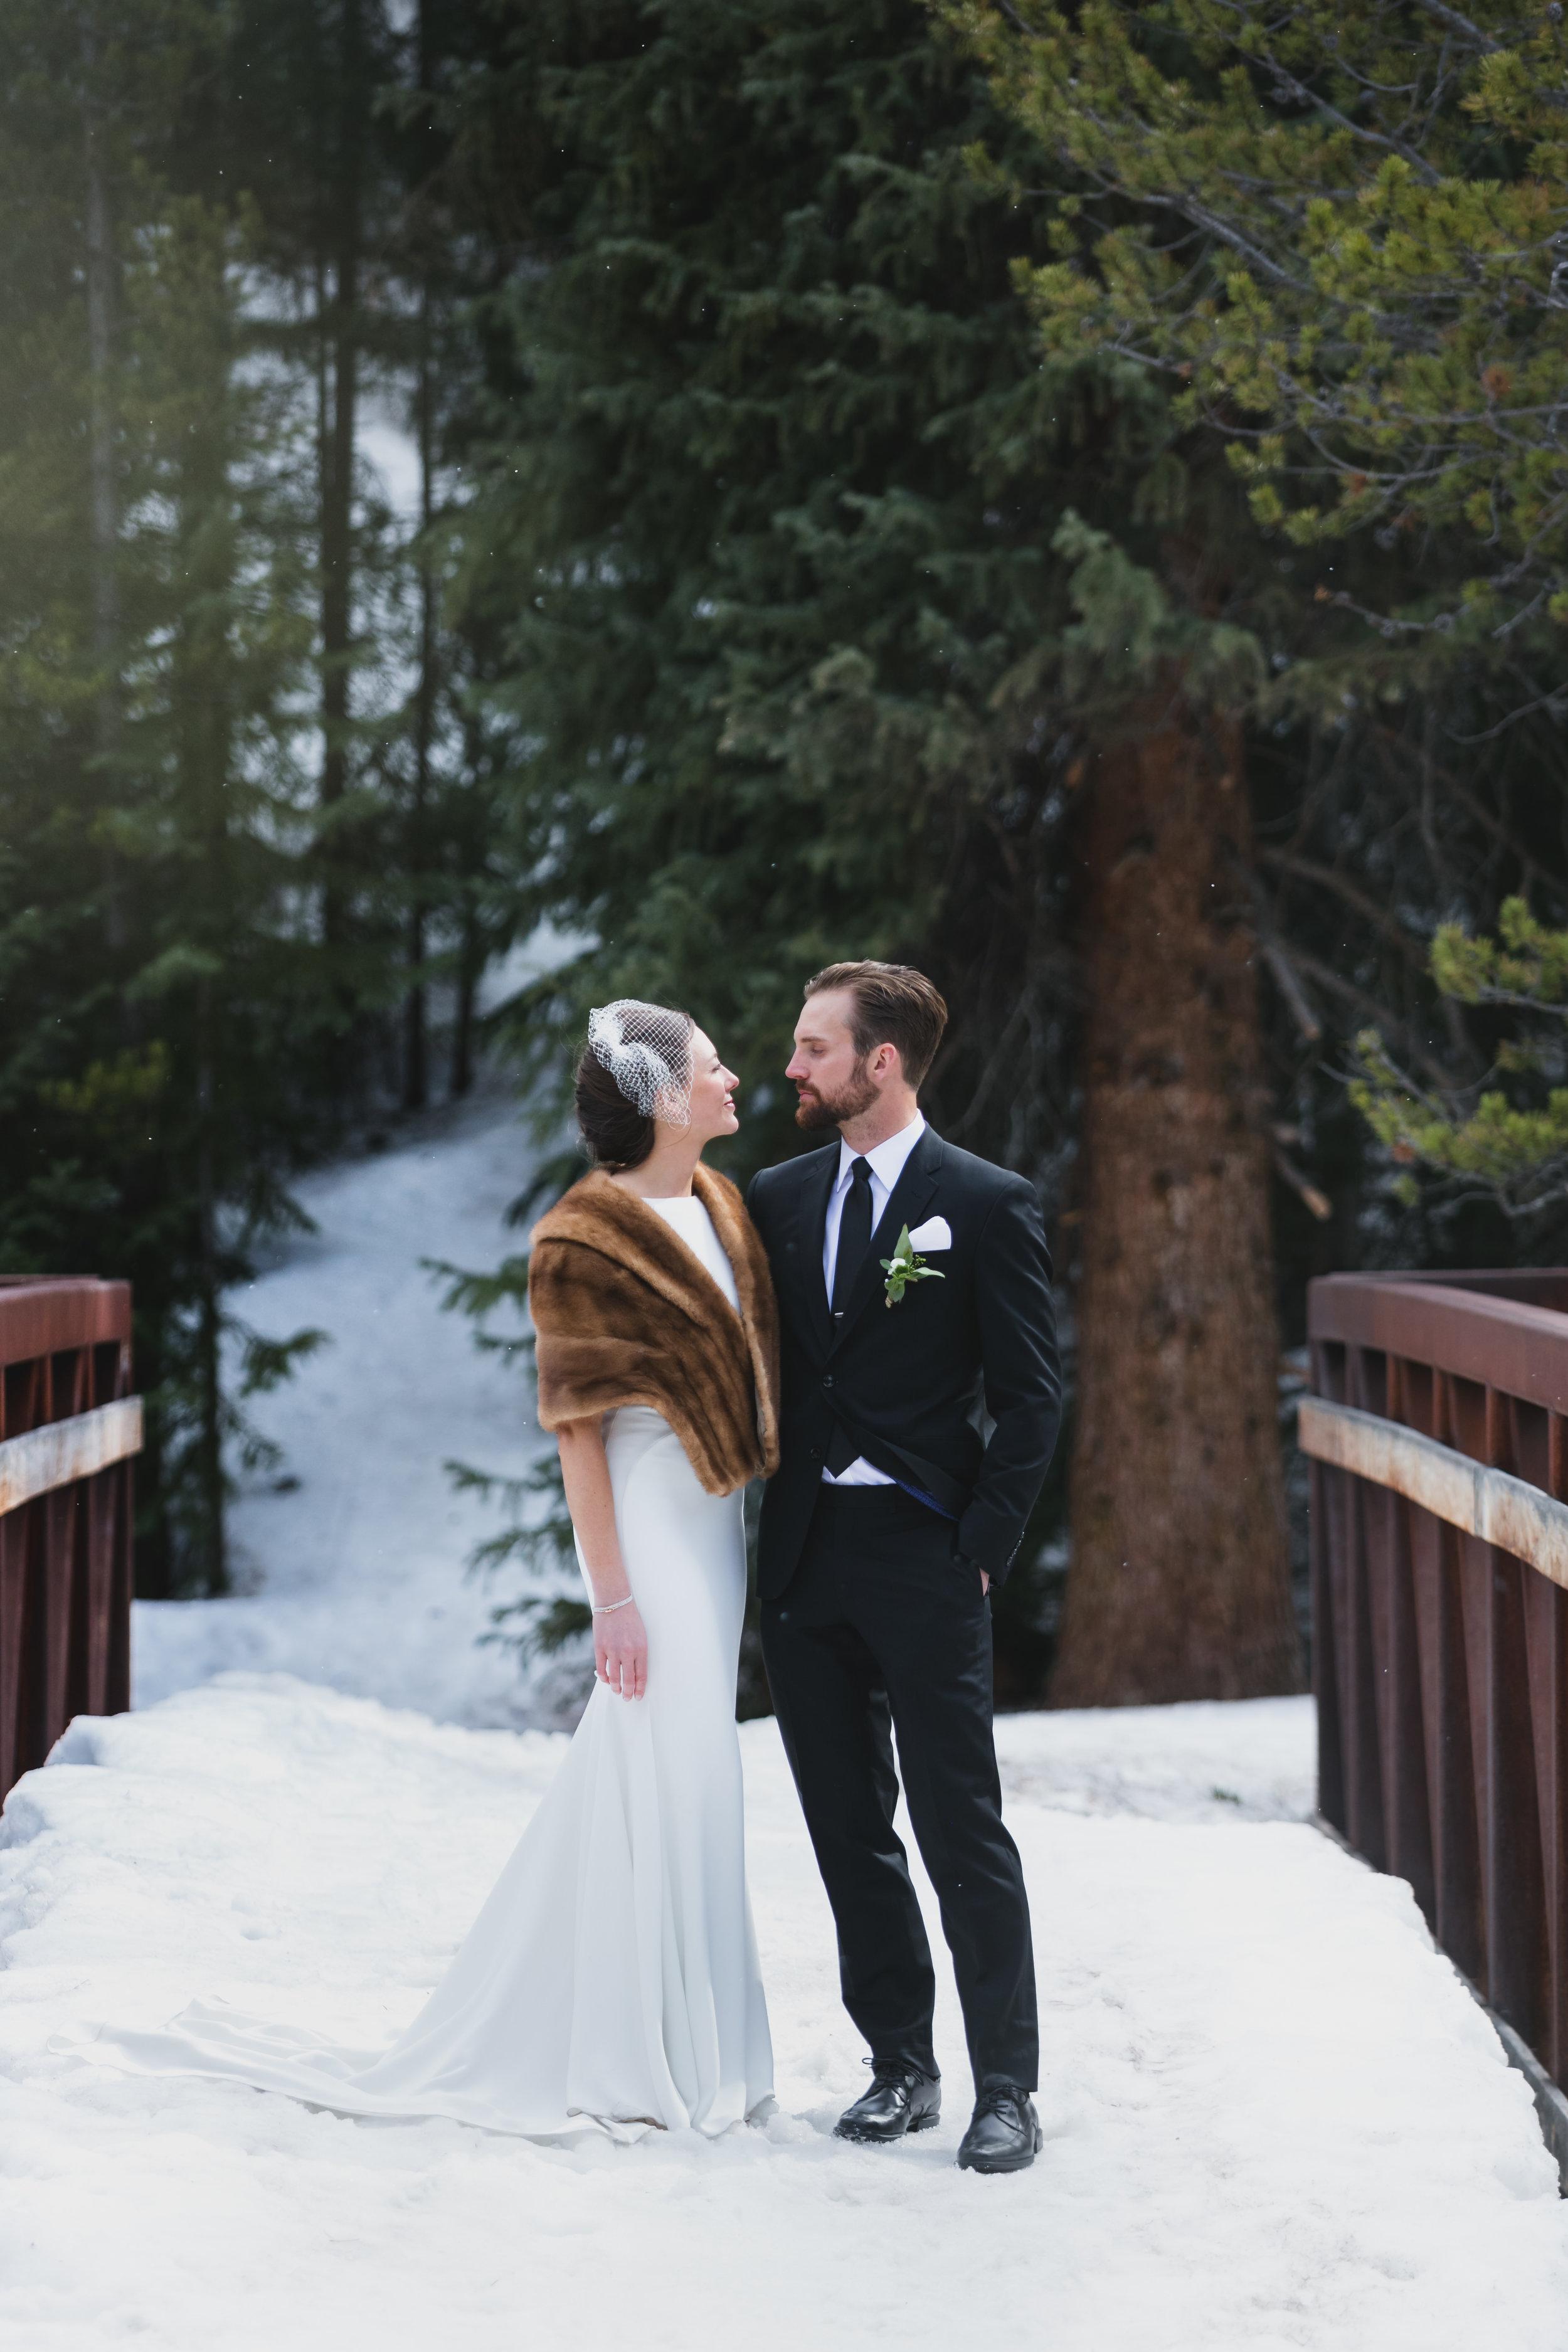 vild-photography-photographer-colorado-intimate-wedding-adventure-Stephanie- Adam-452.jpg